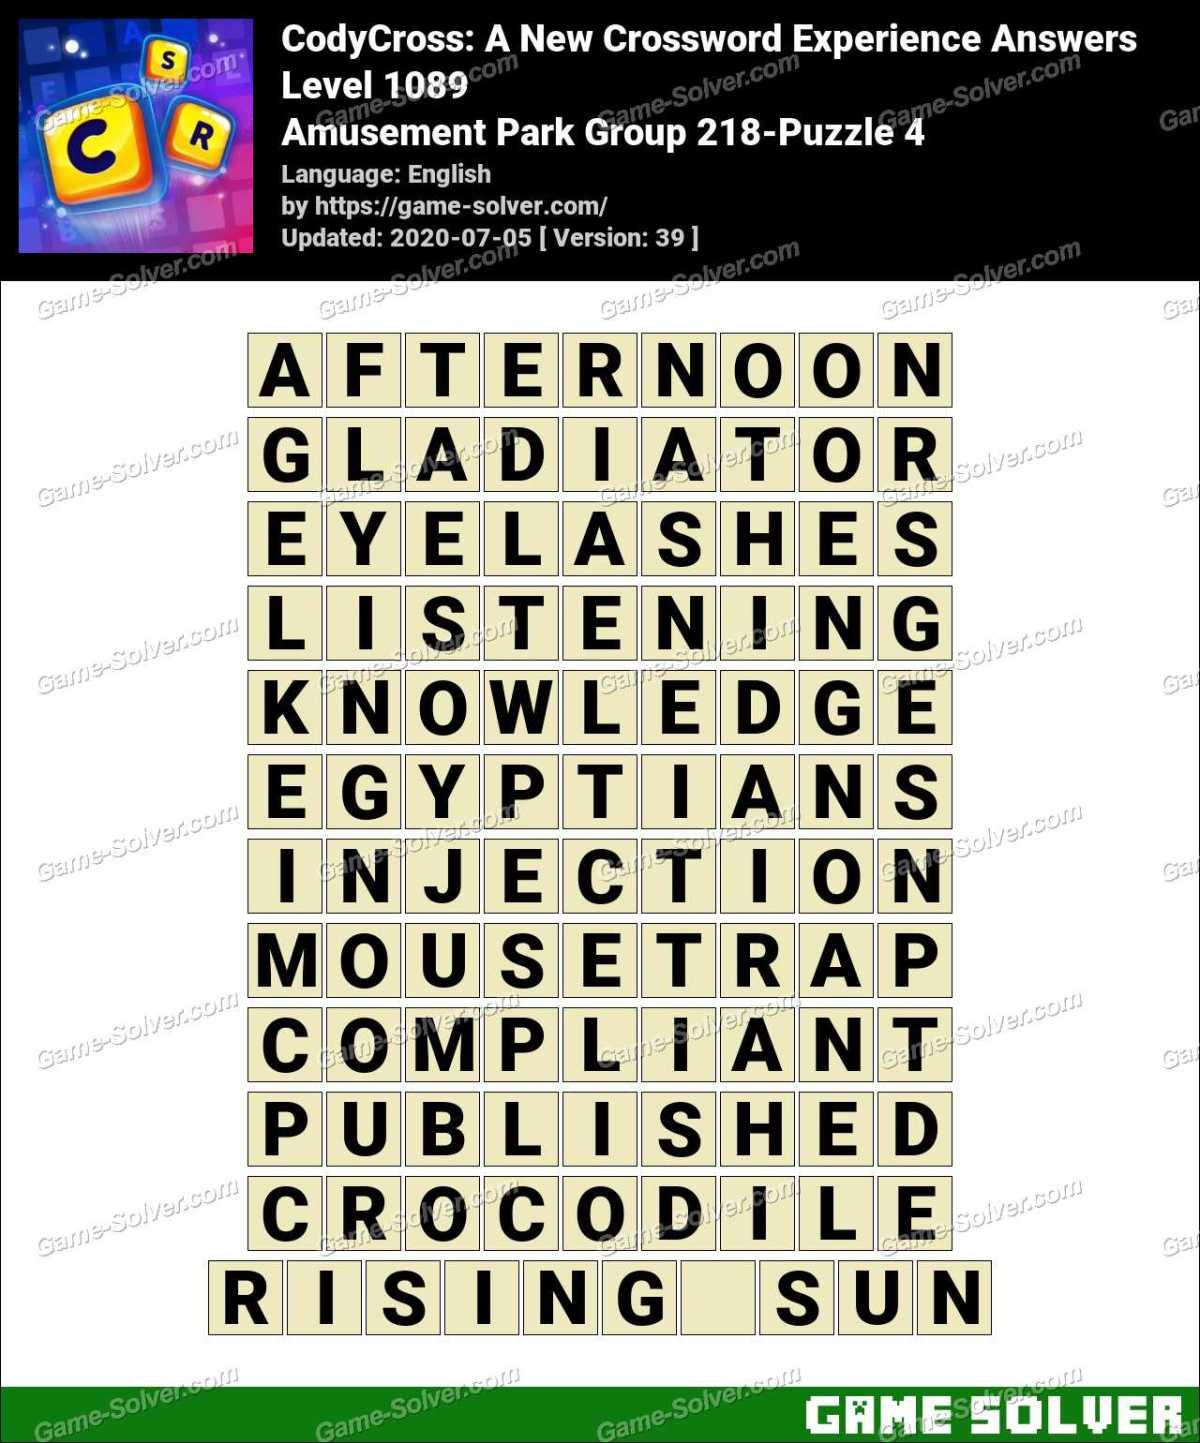 CodyCross Amusement Park Group 218-Puzzle 4 Answers